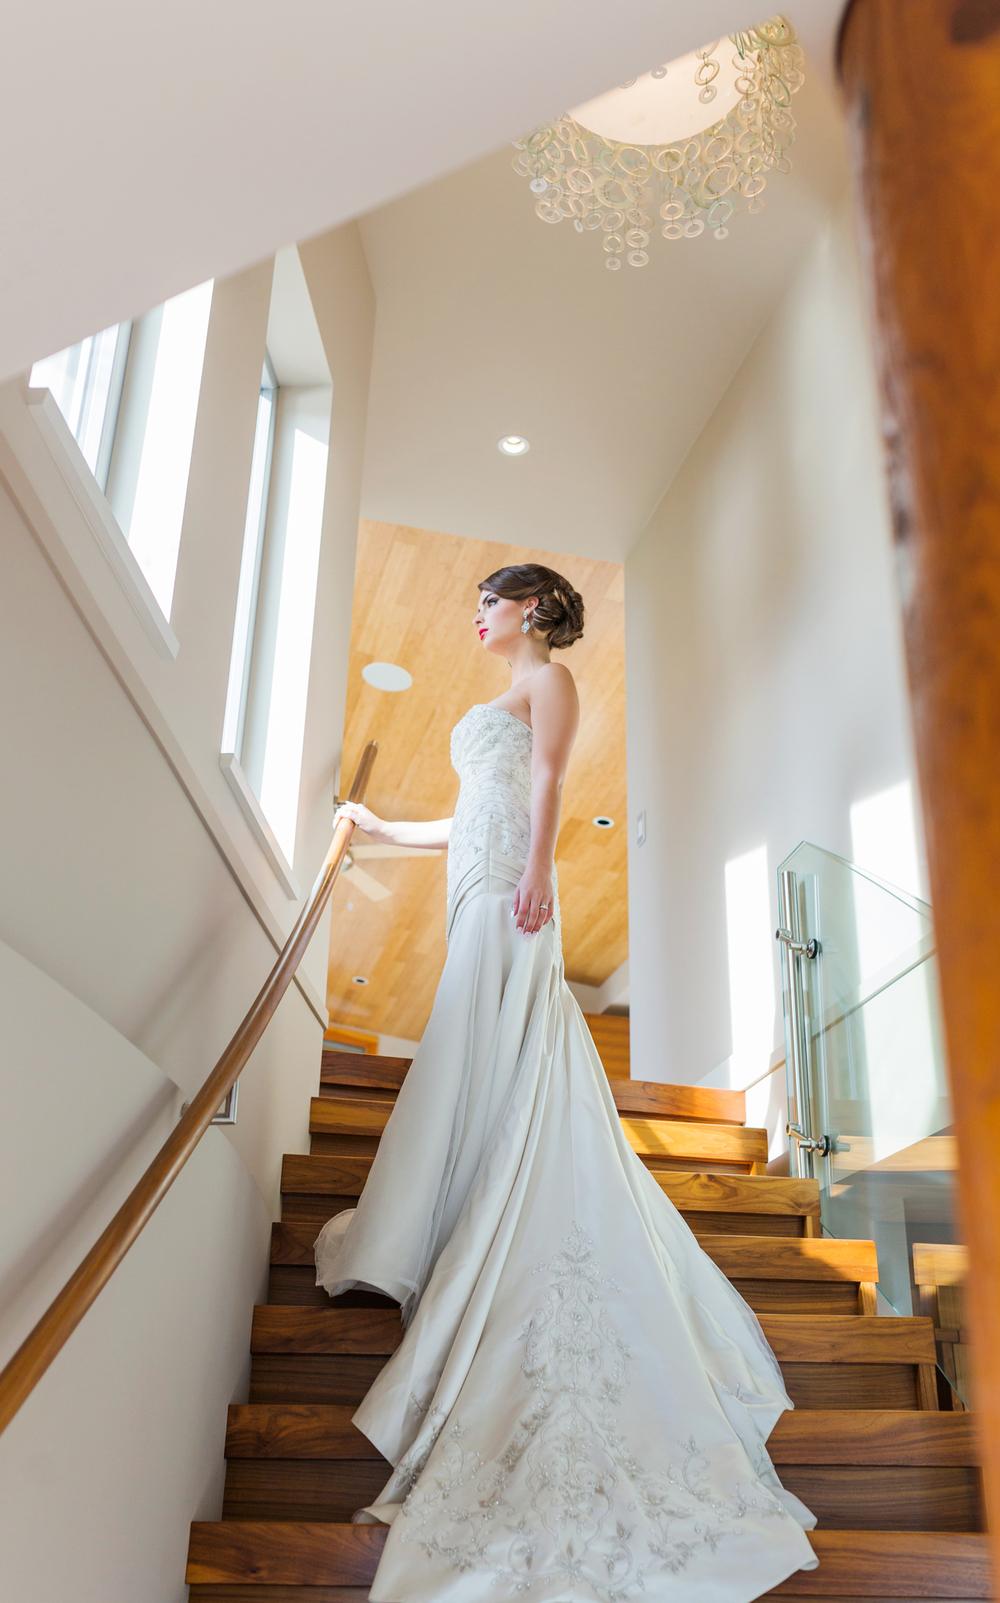 IMG_6419-BRIDAL-EDITORIAL-JENNIFER-PICARD-PHOTOGRAPHY-FINE-ART-WEDDINGS.jpg